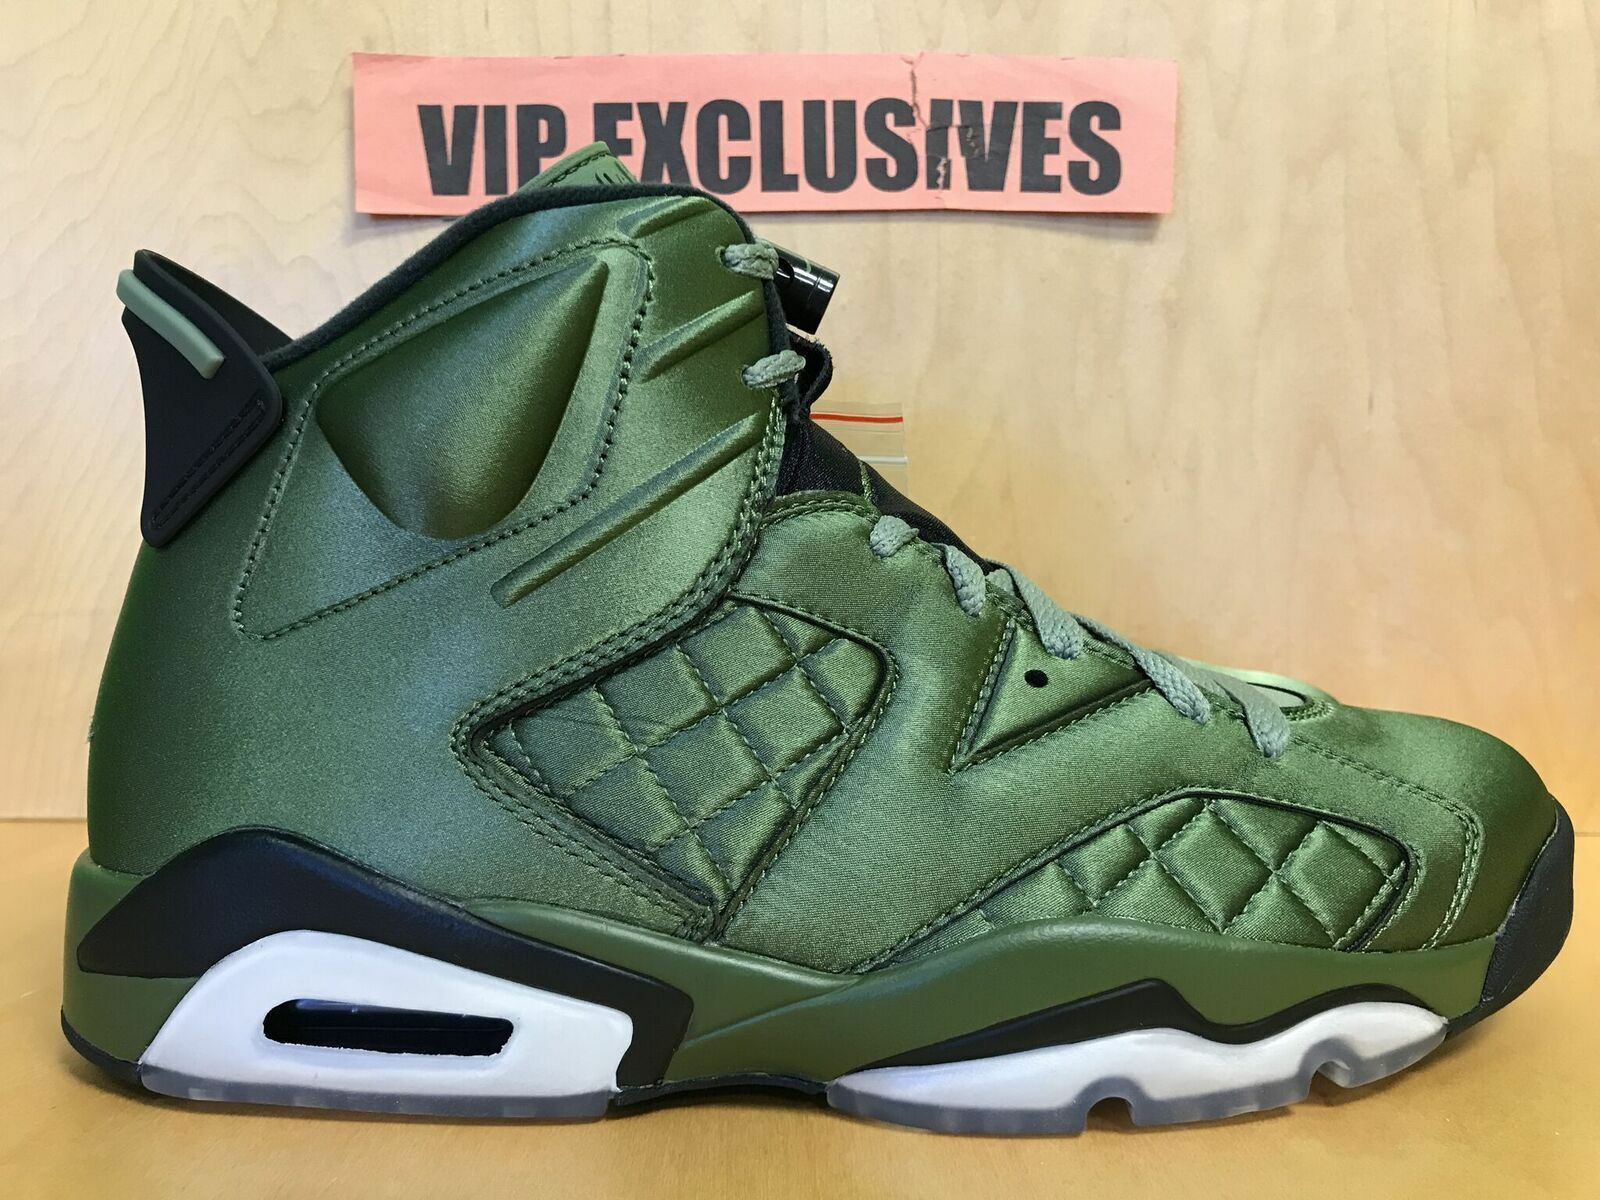 Nike Air Jordan VI Retro 6 Pinnacle Pinnacle Pinnacle Olive Promo Jacket AH4614-303 Size 8.5 37a584